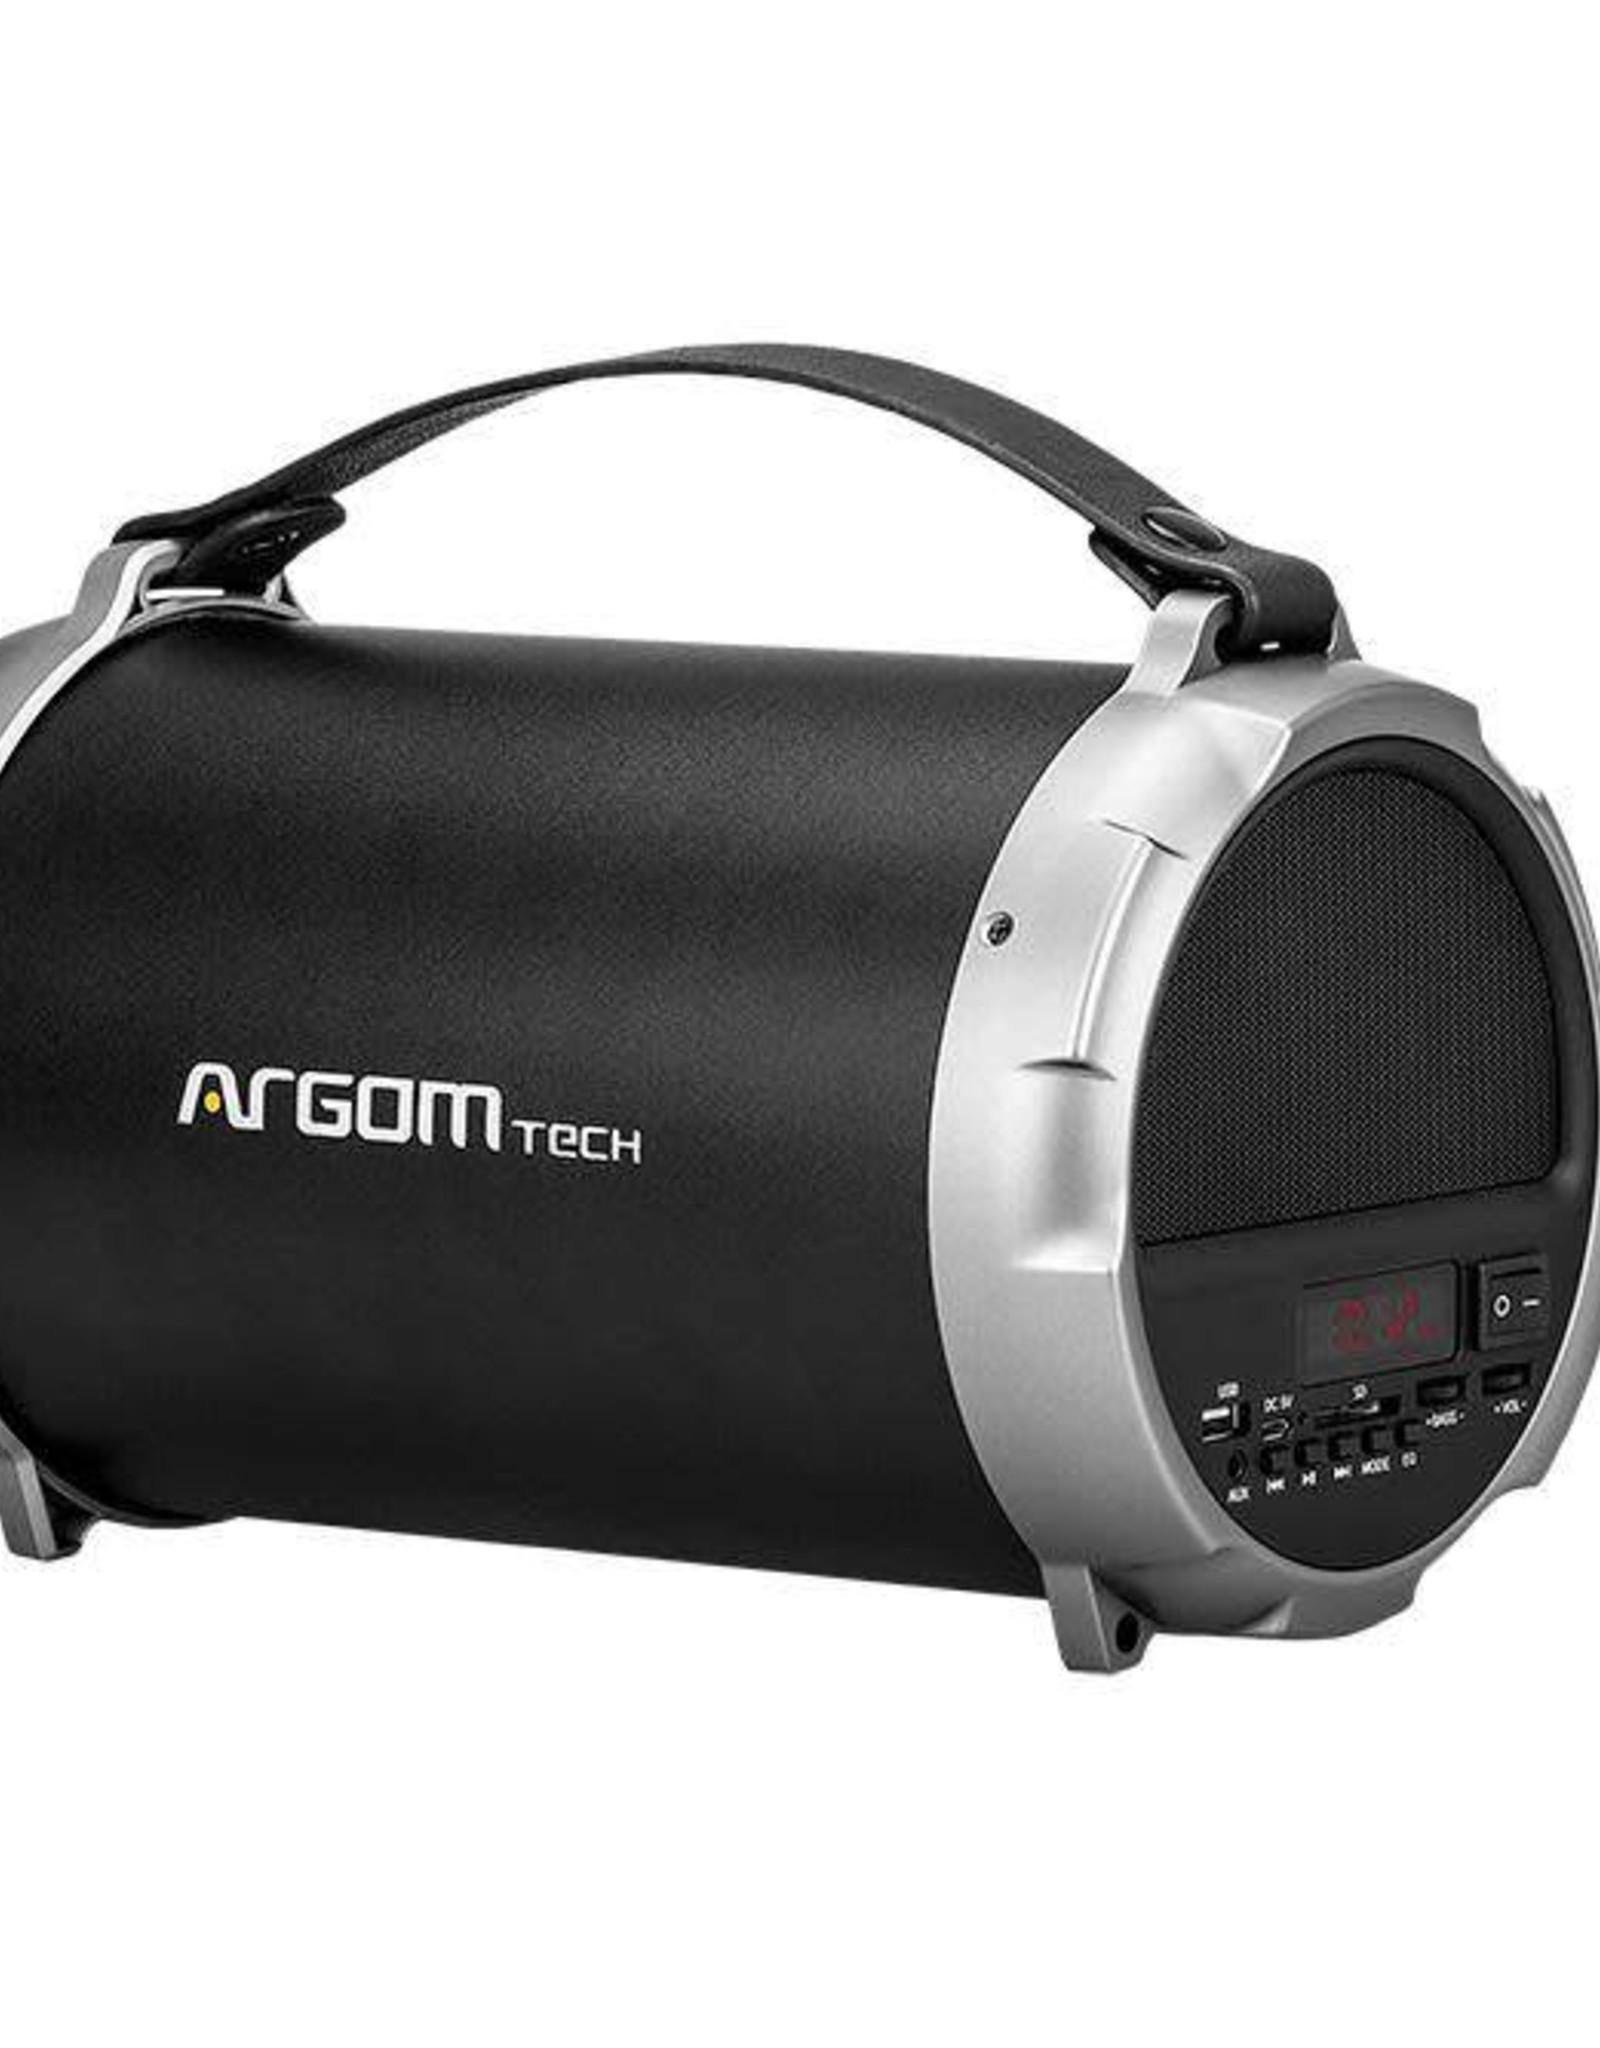 Argom Tech Argom Tech Bazooka Beats + 2.1 Ch FM Speaker